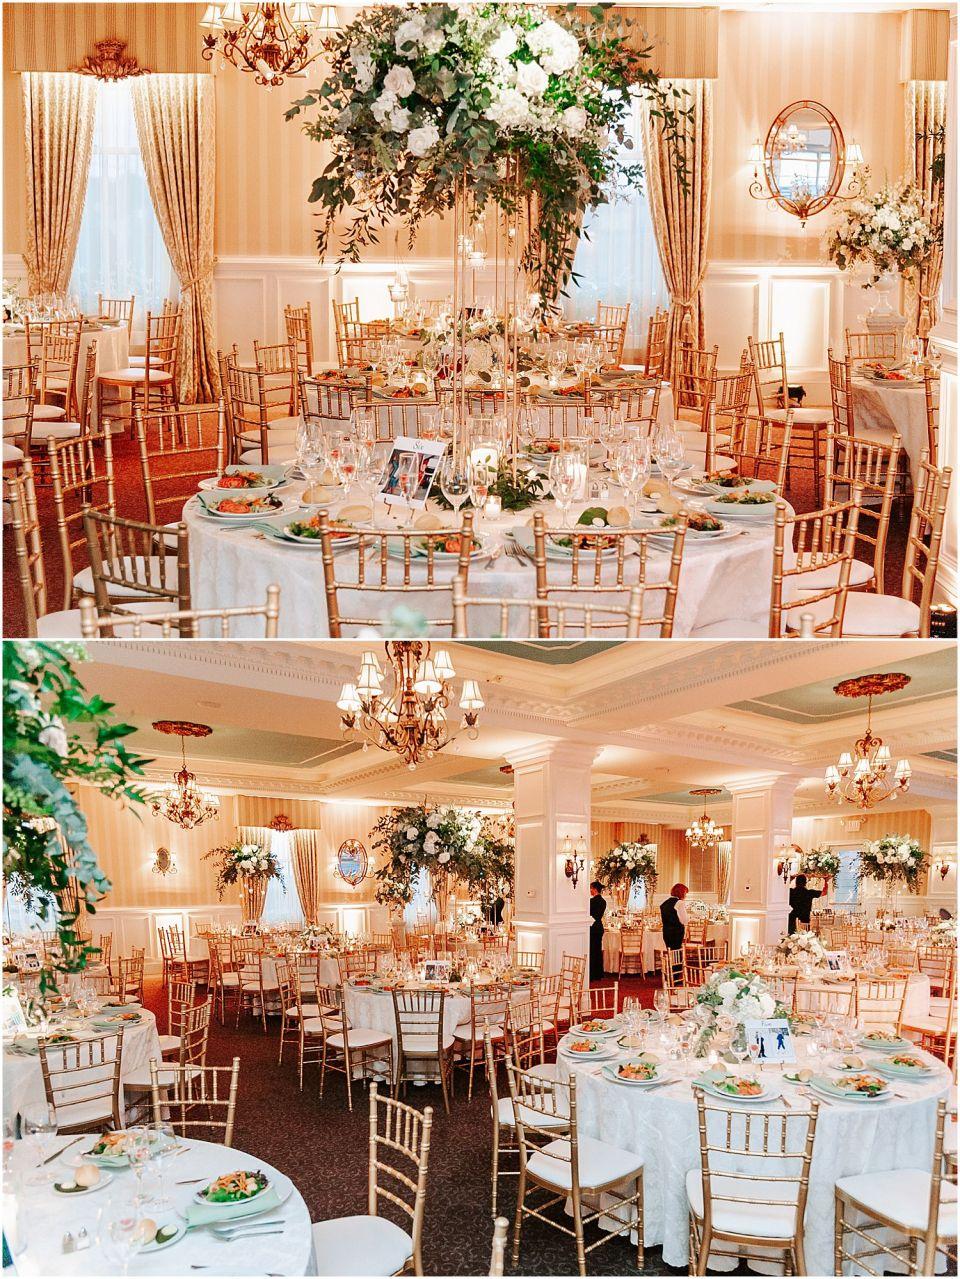 Capturing the lovely reception setup at this Mallard Island Yacht Club Wedding